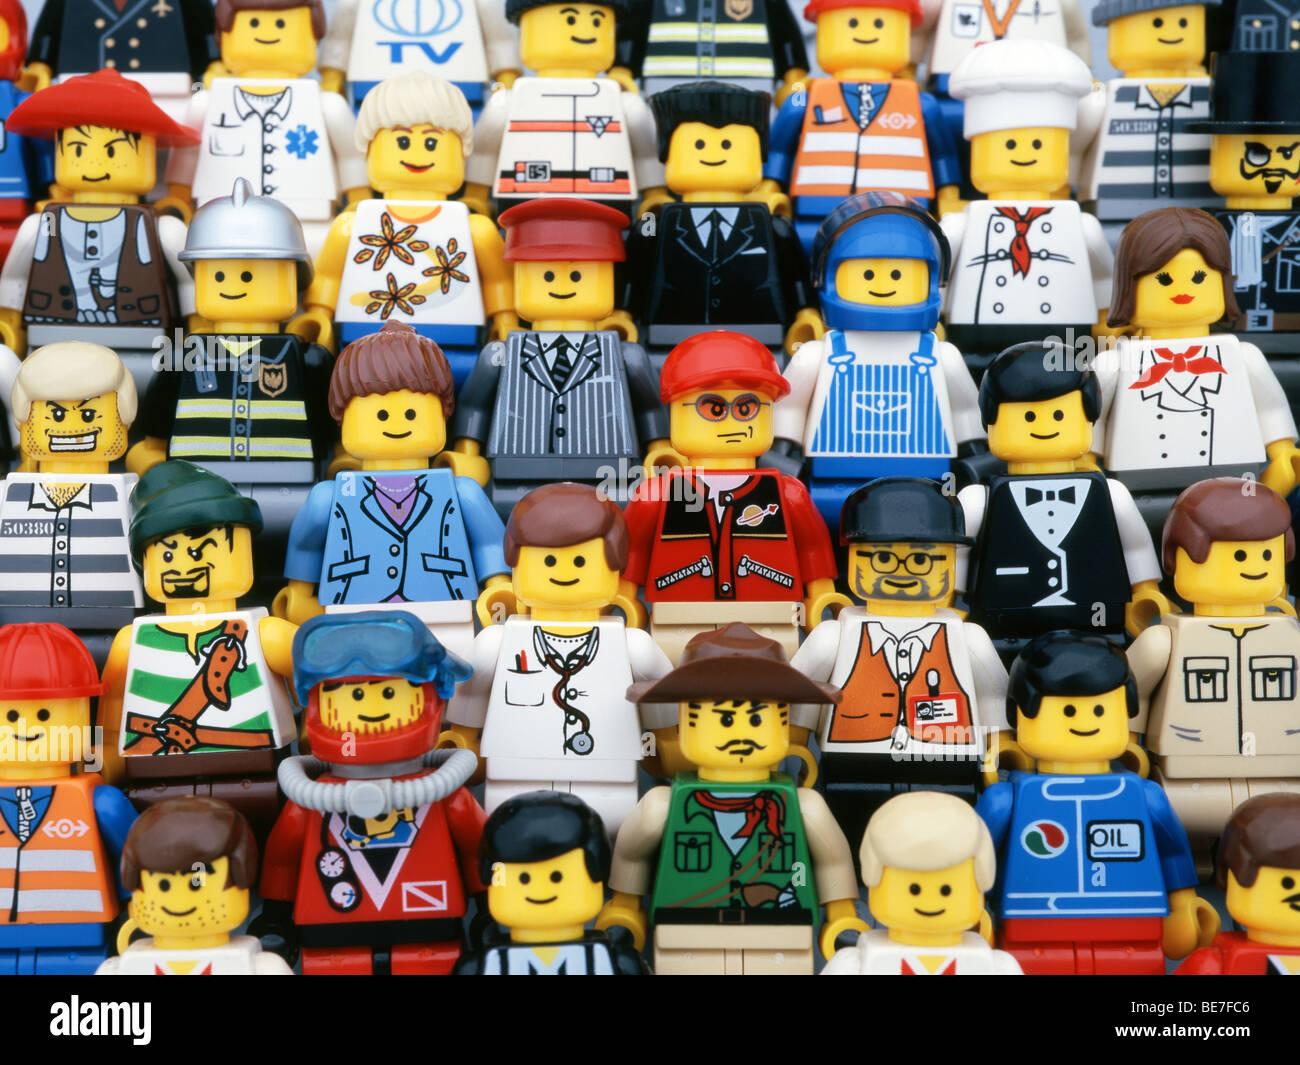 Lego Minifigures - Stock Image